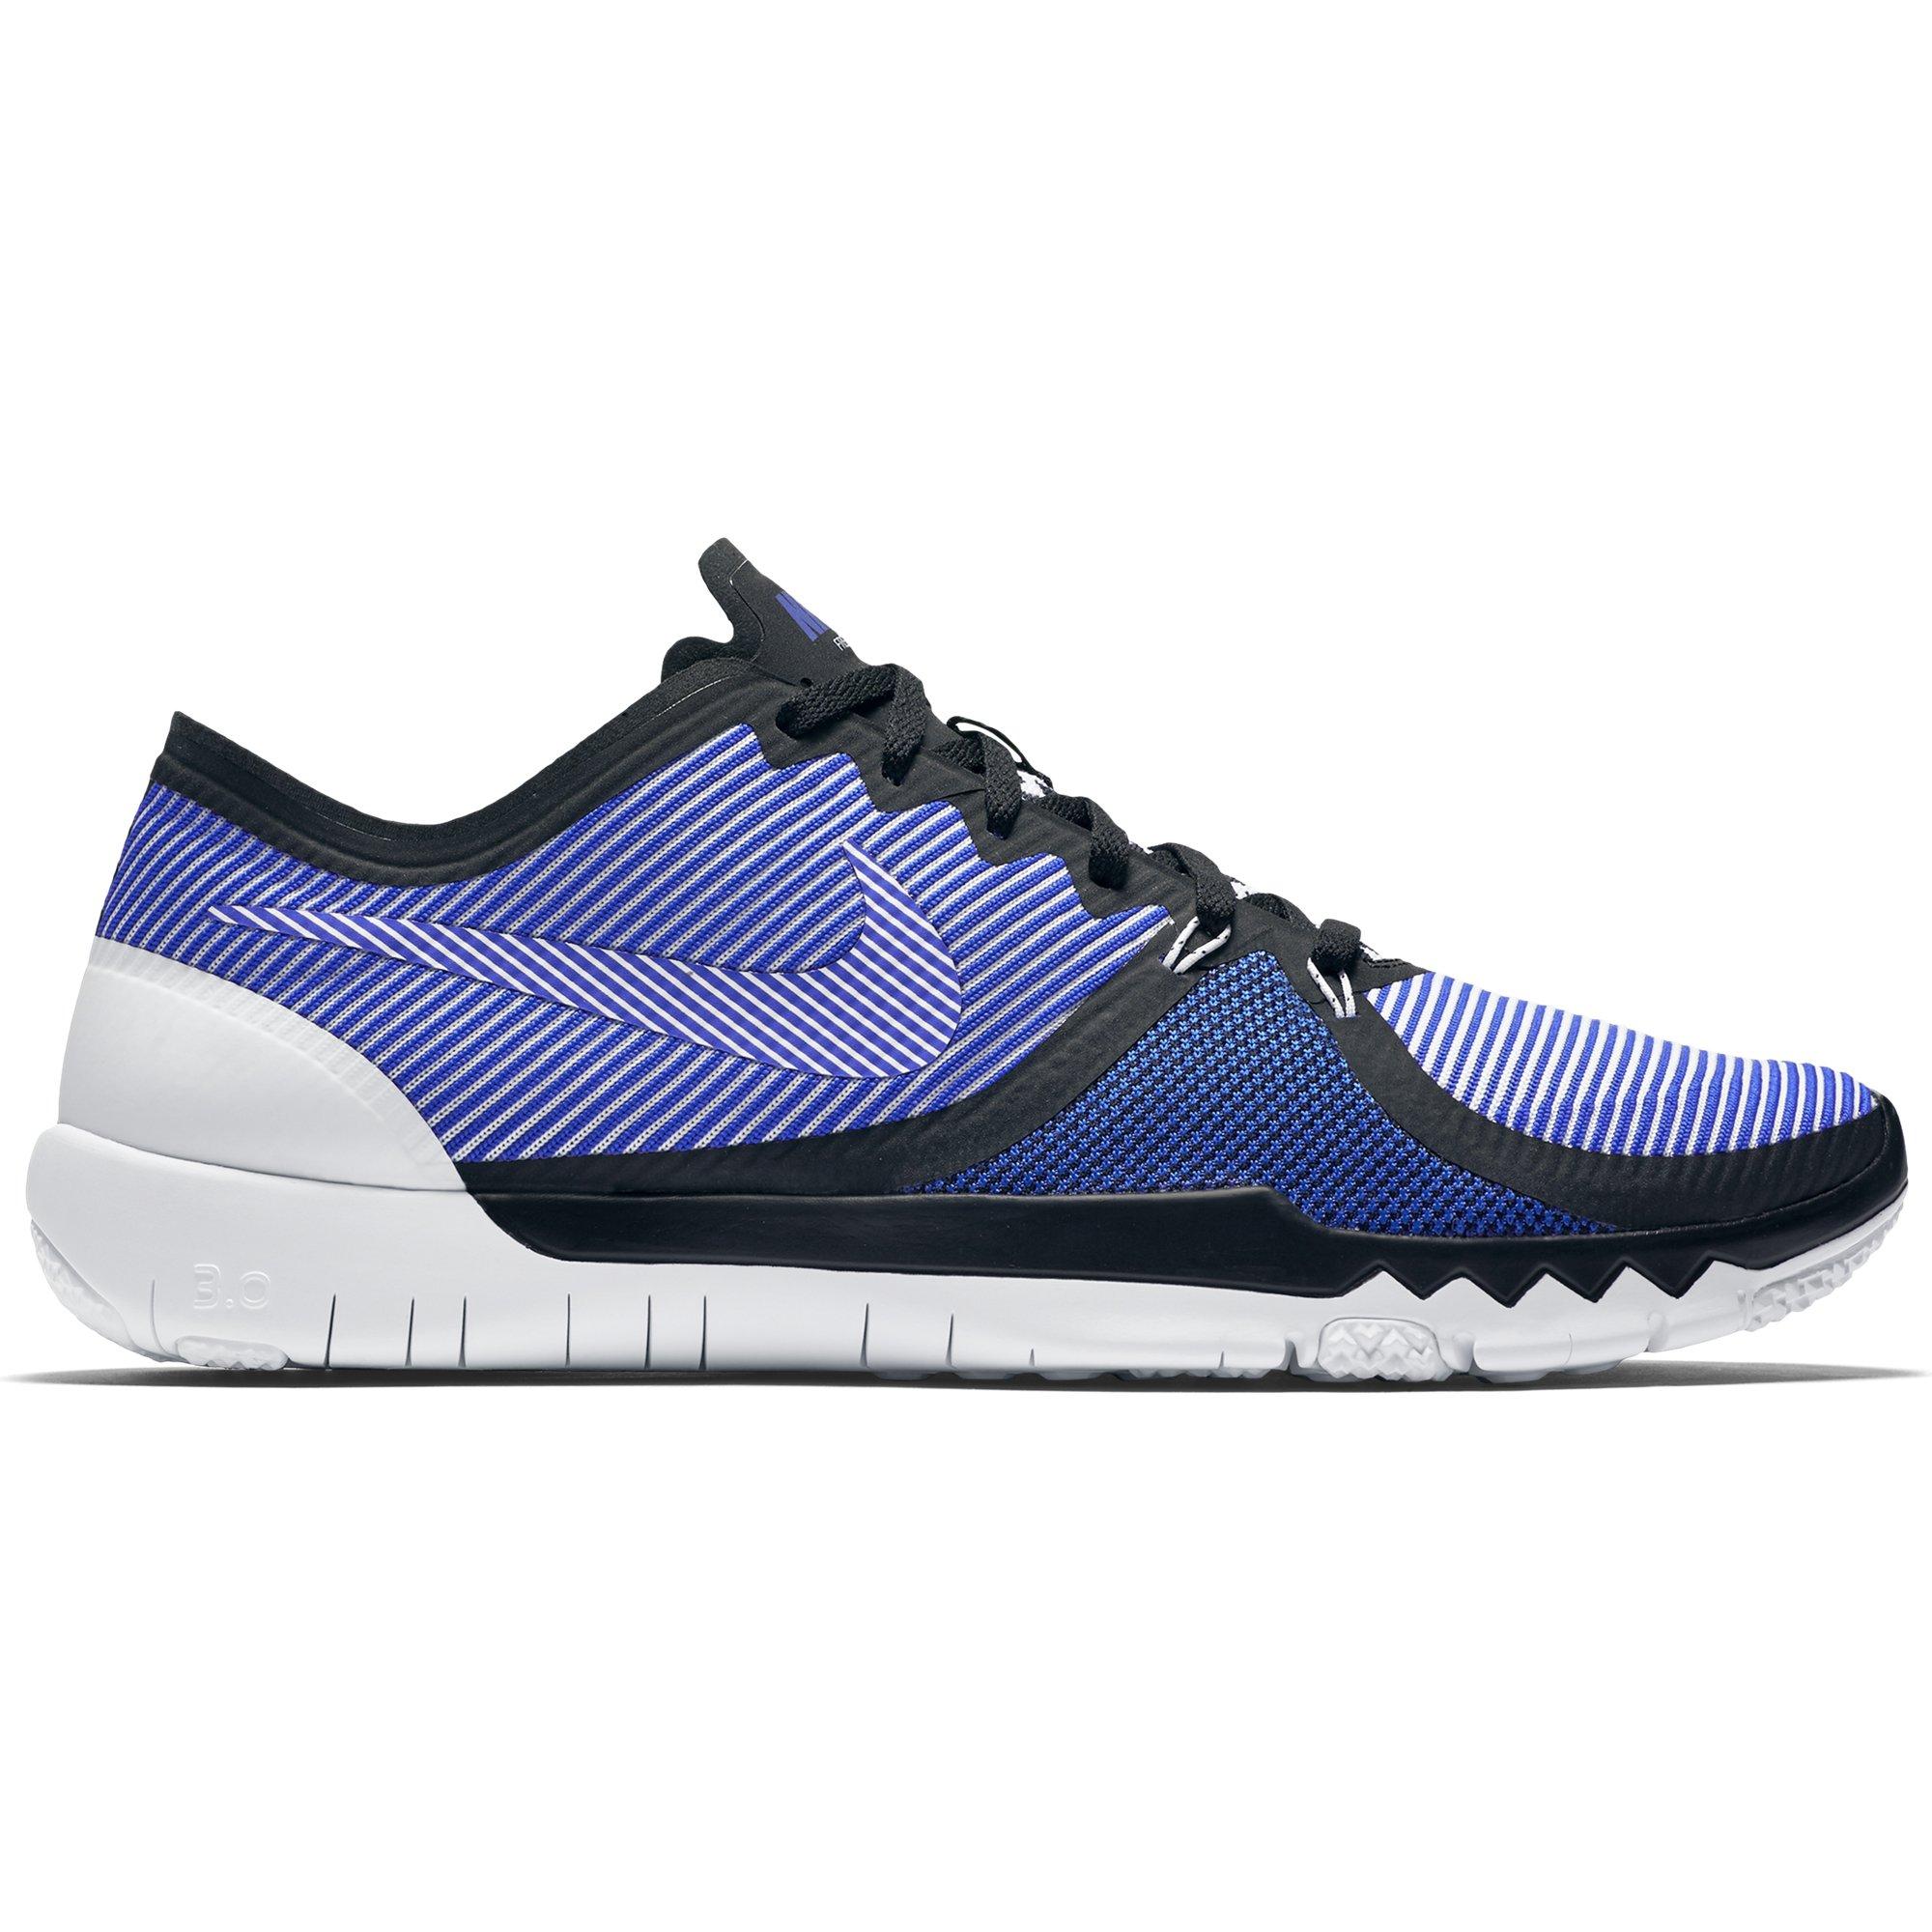 36e5df2164c7a Galleon - Nike Mens Free 3.0 Training Shoe Black Racer Blue White 8